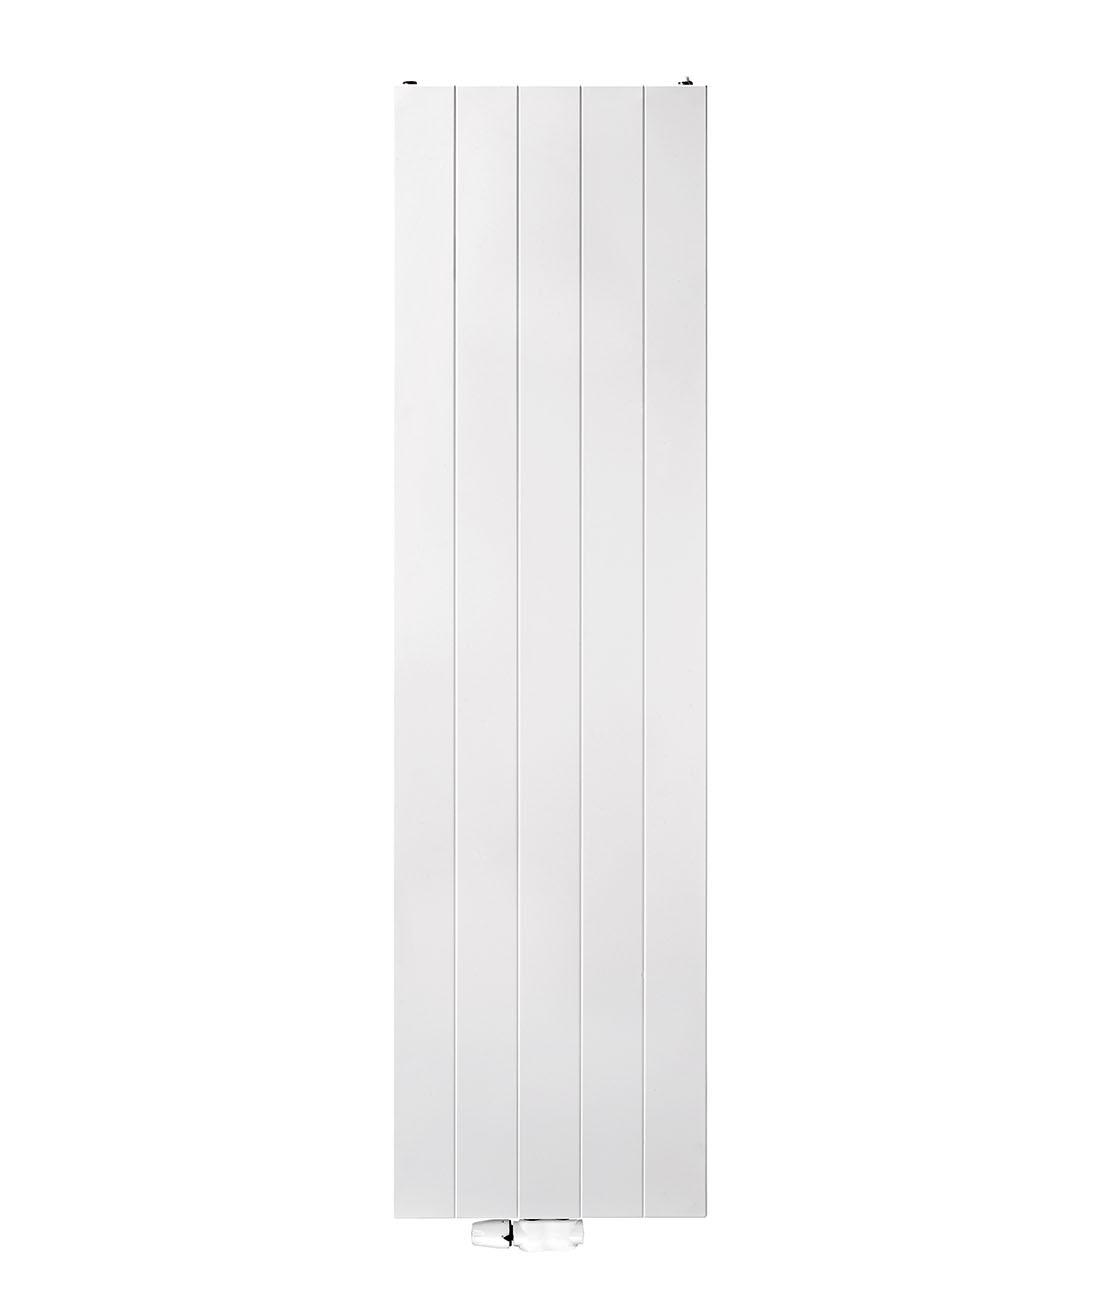 Henrad Alto Line paneelradiator type 22-2200x700mm